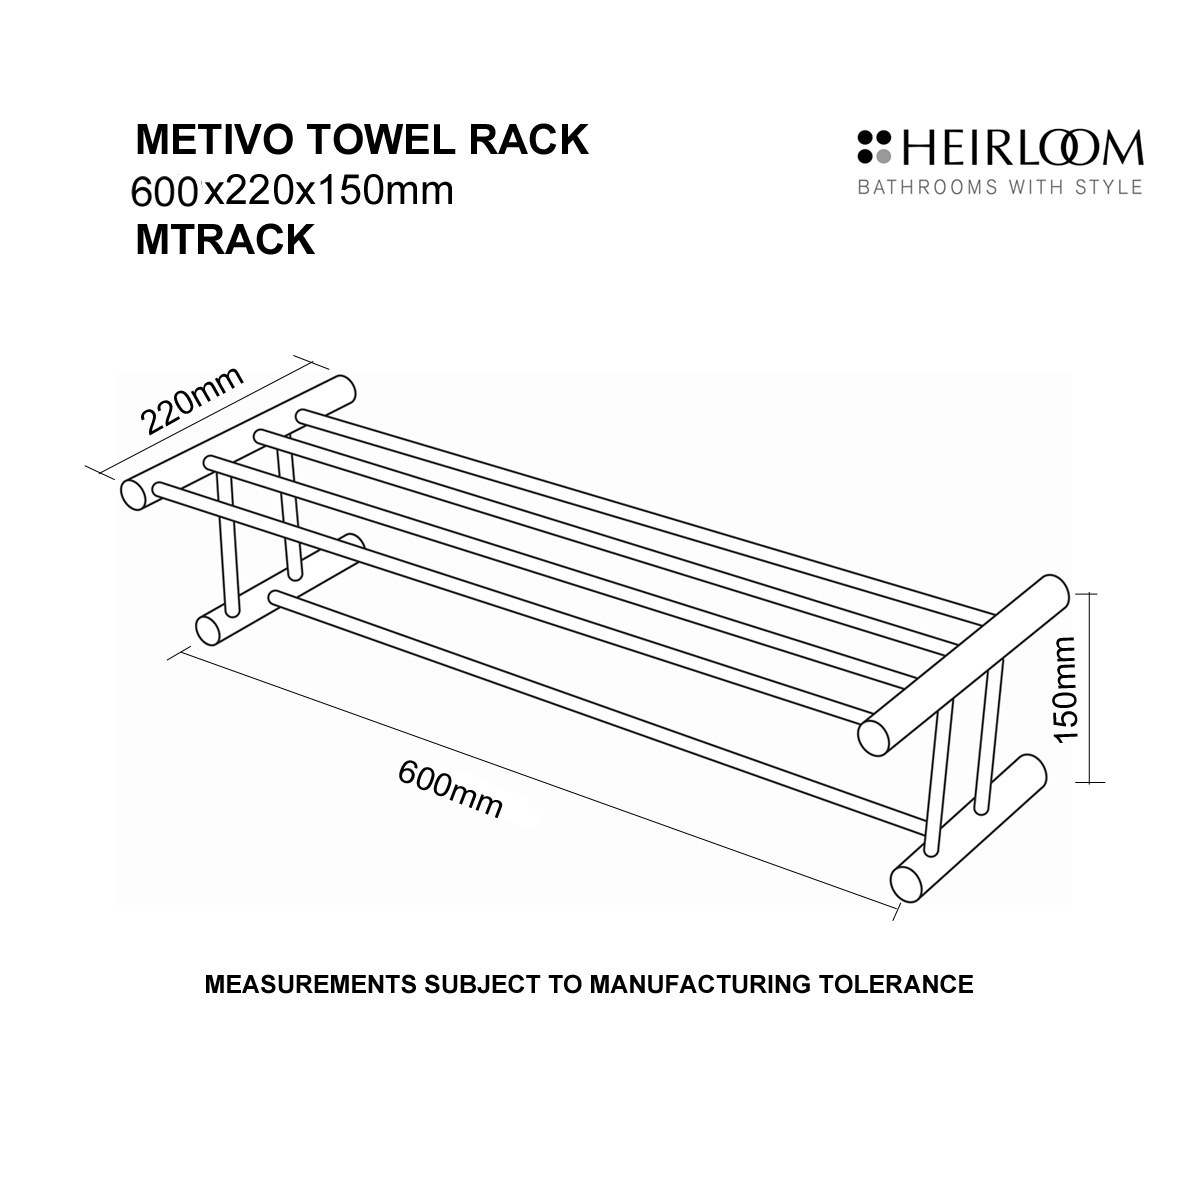 Hardware Direct Heirloom Metivo Towel Rack Mtrack